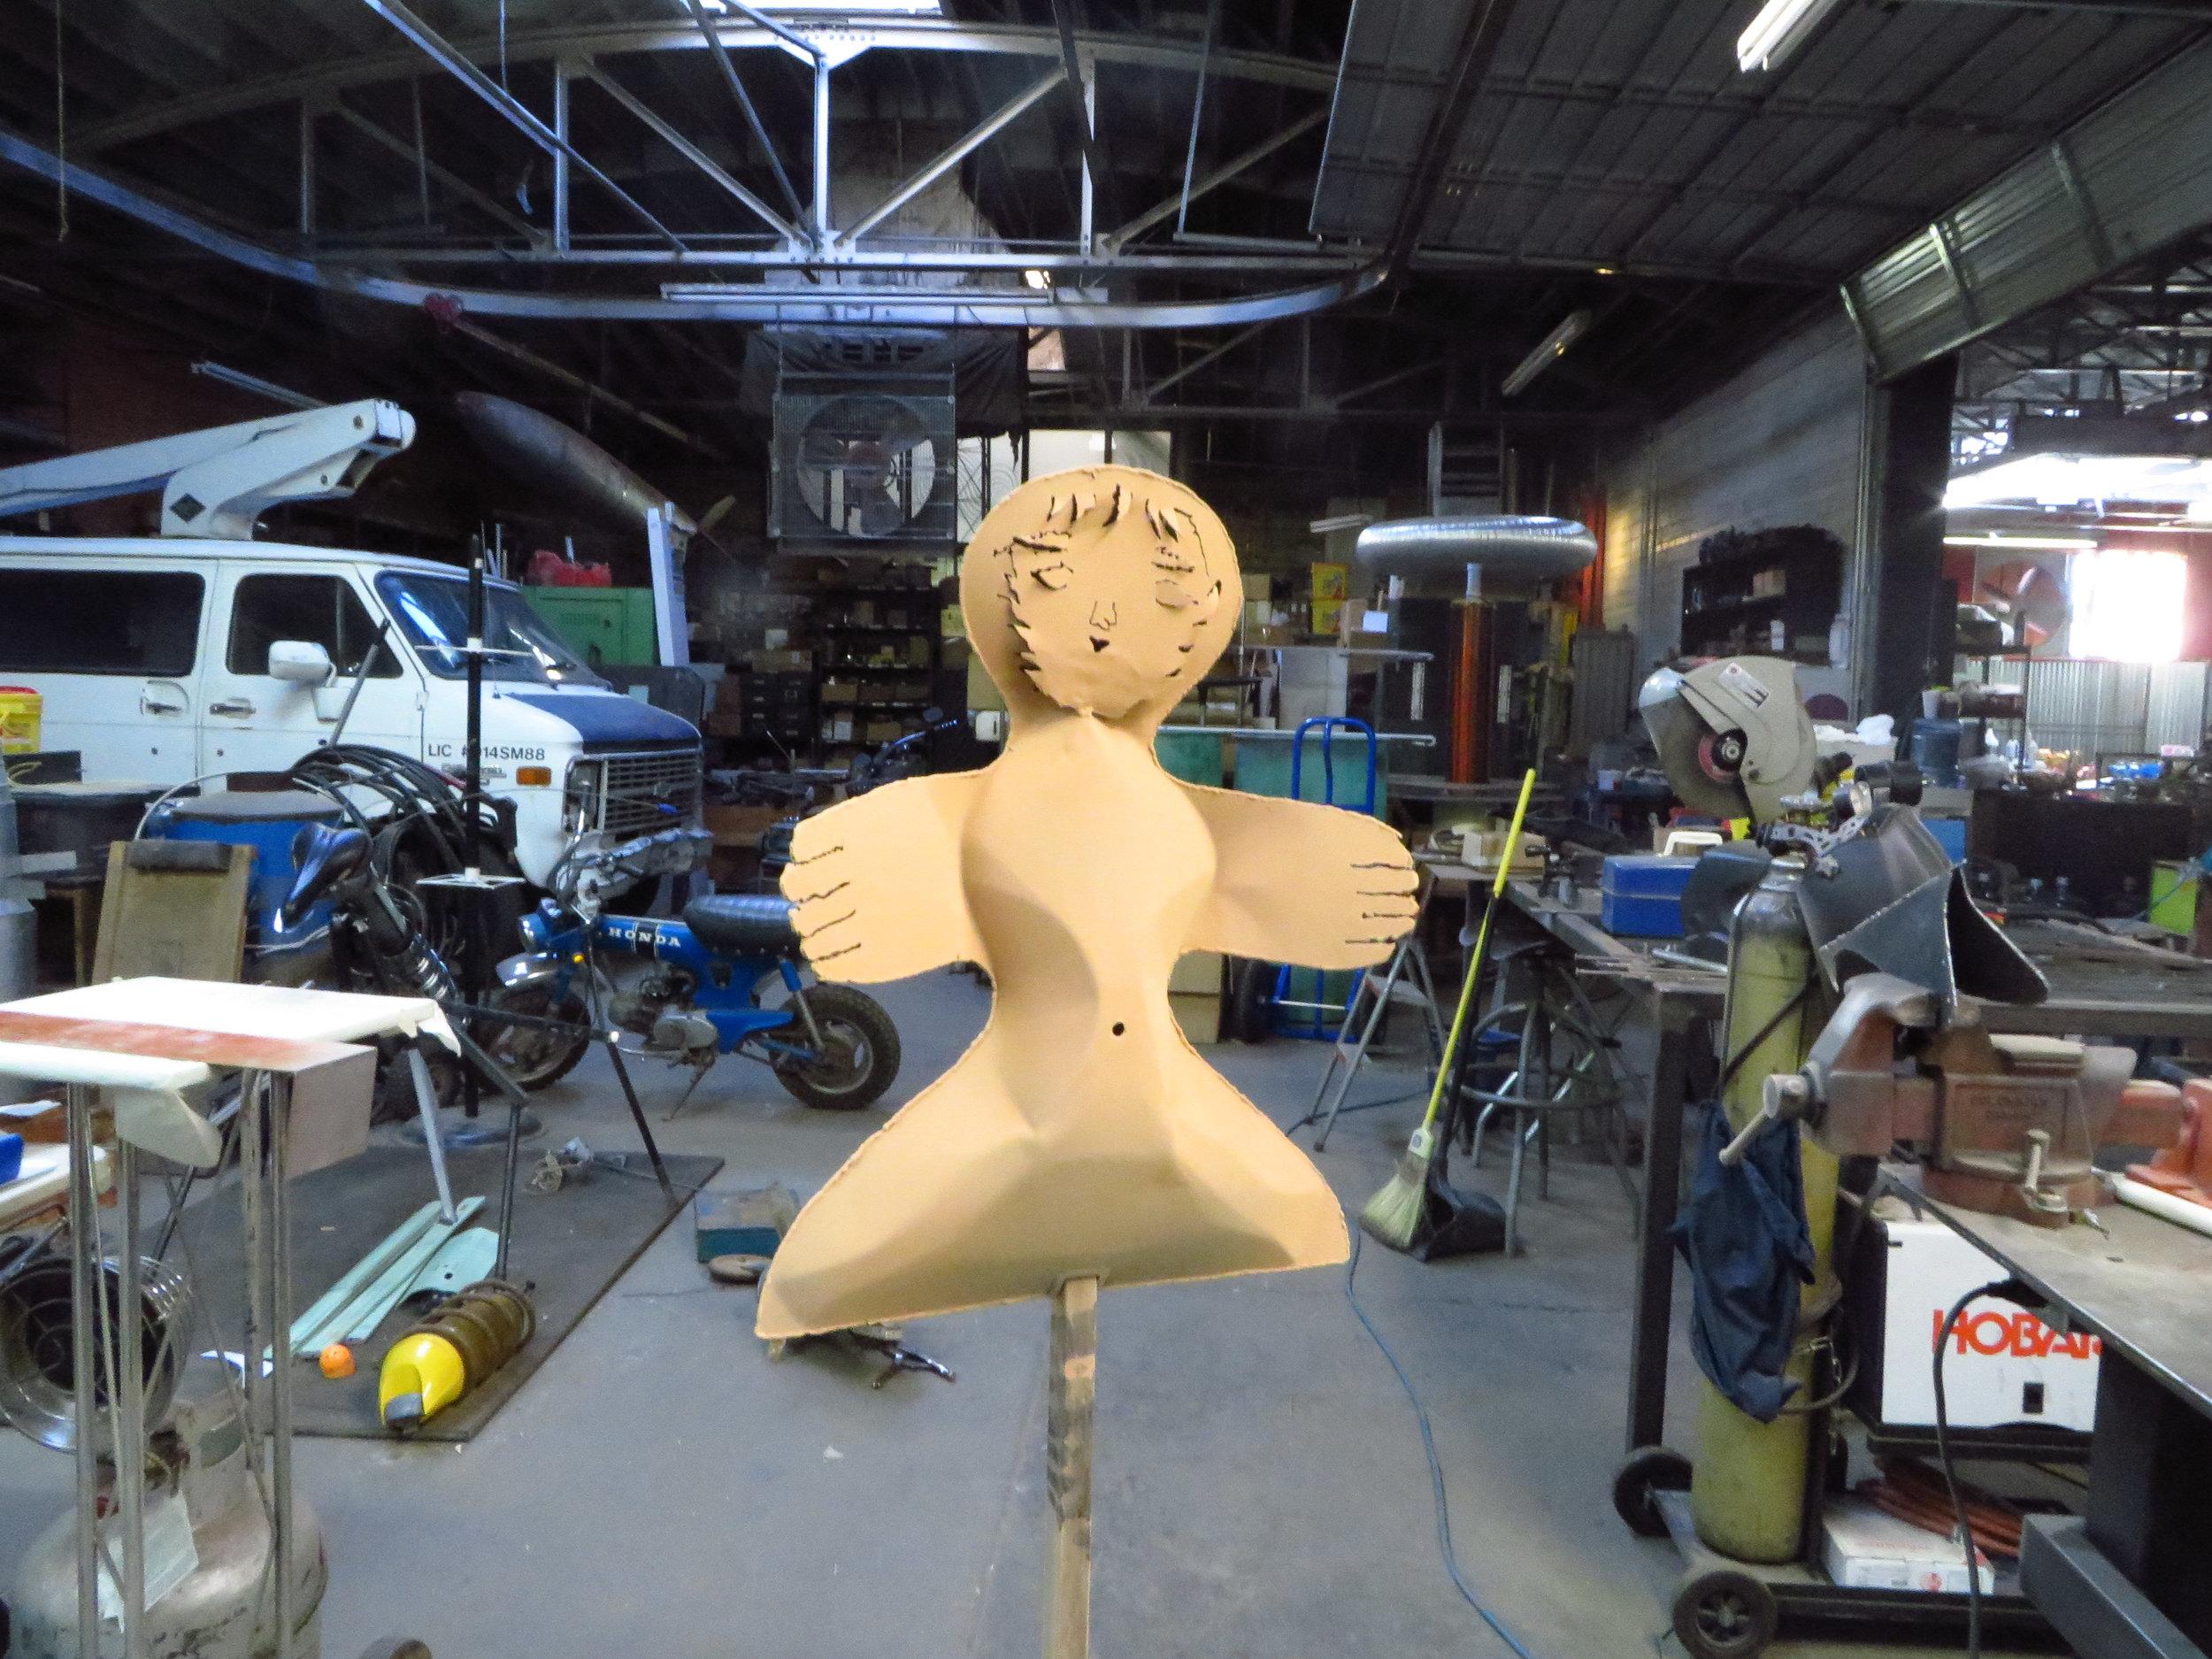 Making metal sculpture in Tony Greer's shop